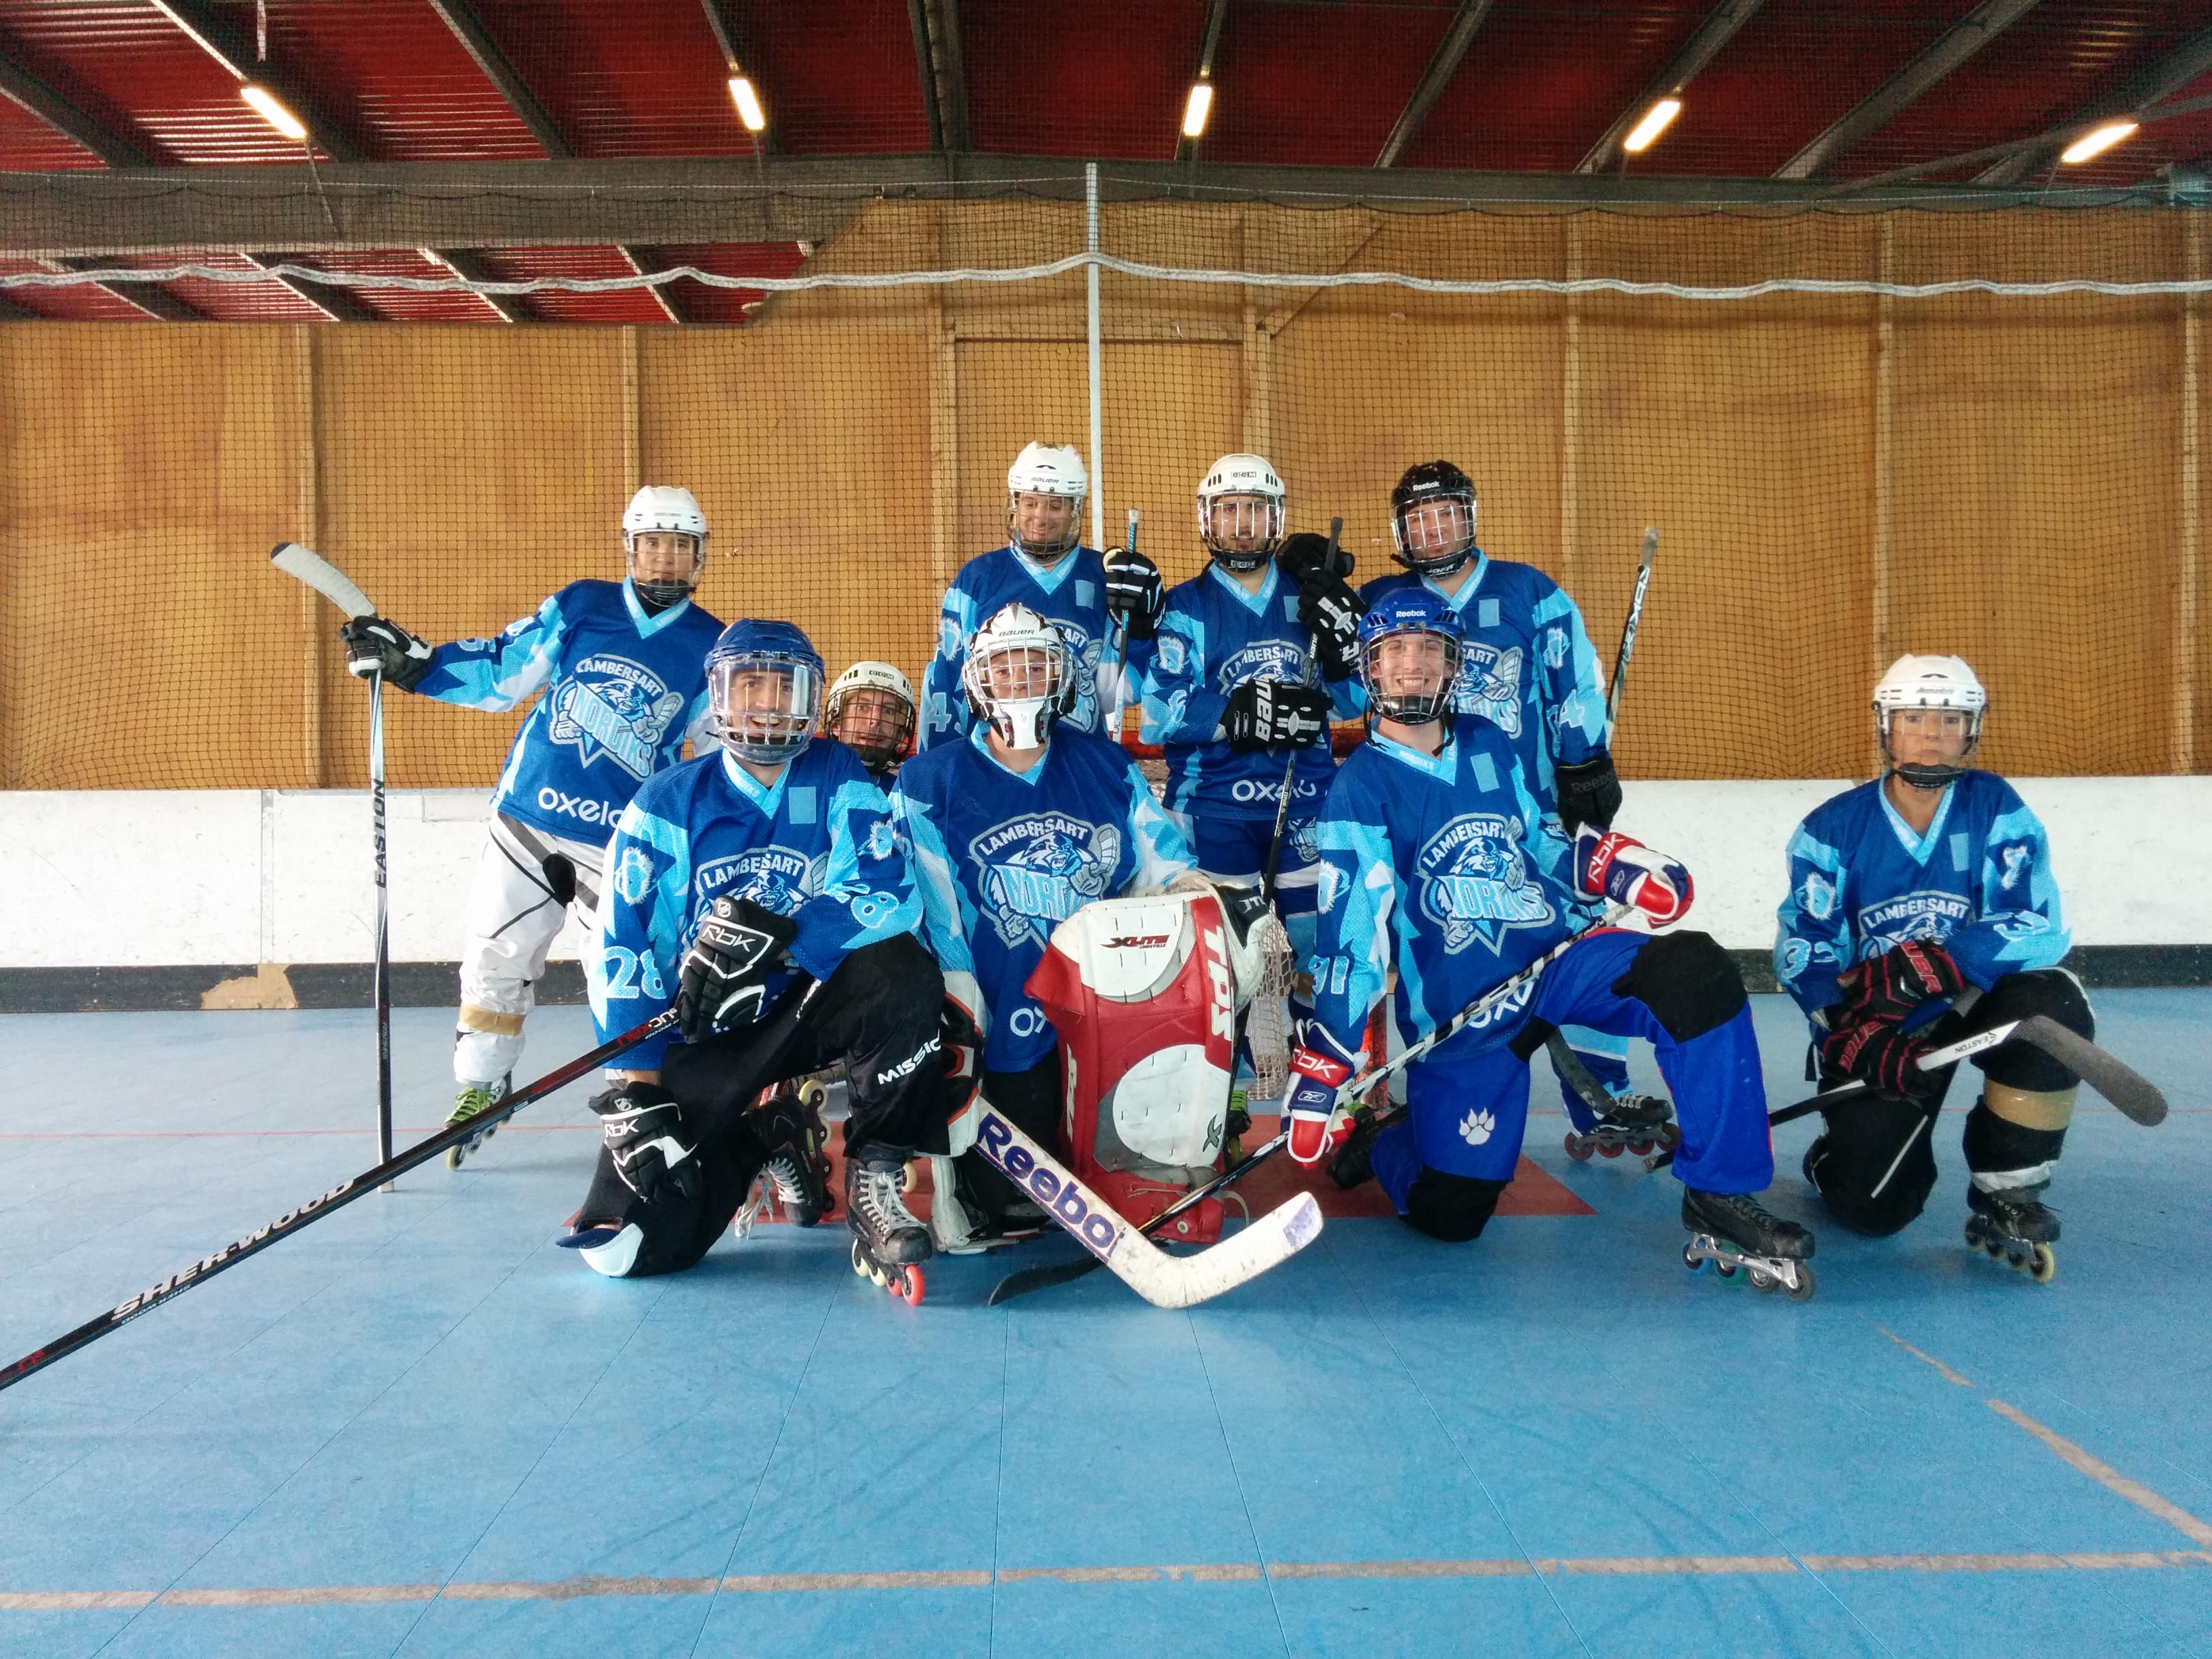 L'équipe de roller hockey des Nordiks de Lambersart